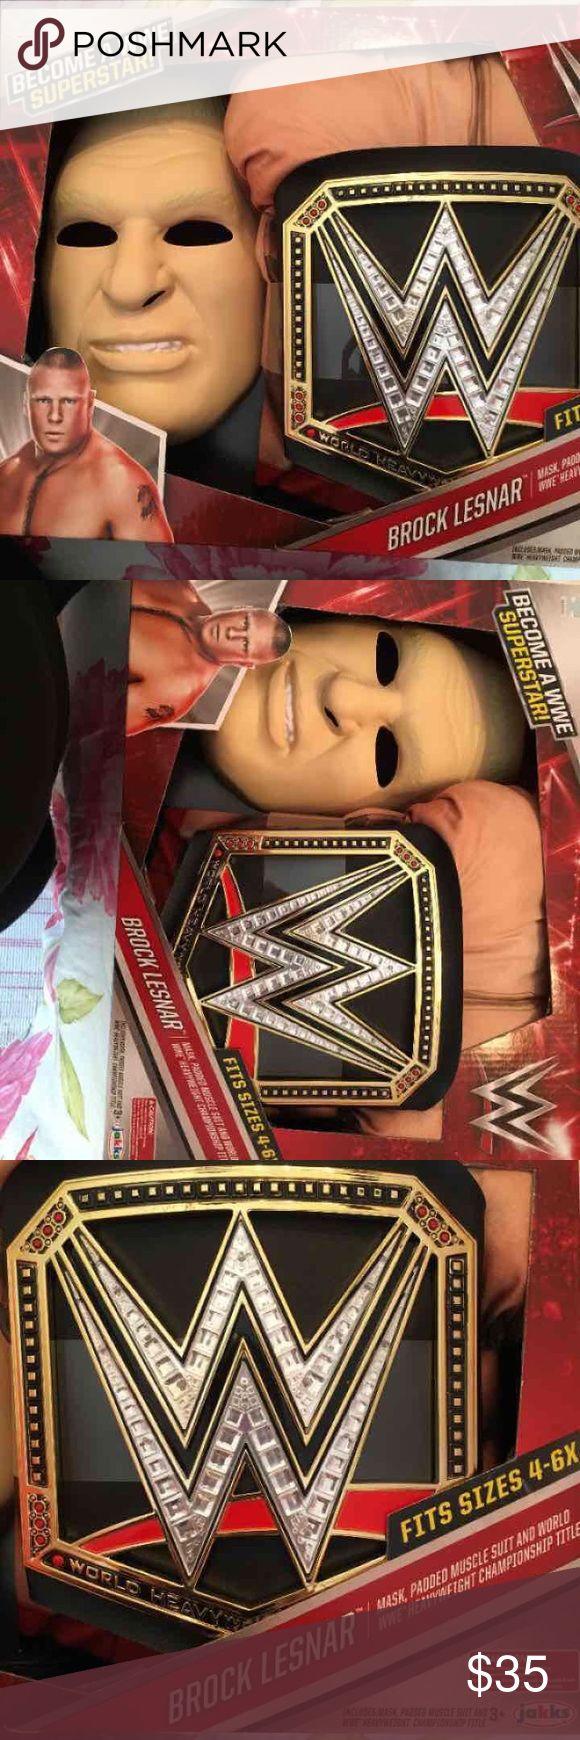 WWE Brock Lesnar Kids Costume Halloween WWE Brock Lesnar Kids Costume Includes mask, padded muscle suit & championship belt Summer slam Halloween, dress up, pretend play Costumes Halloween